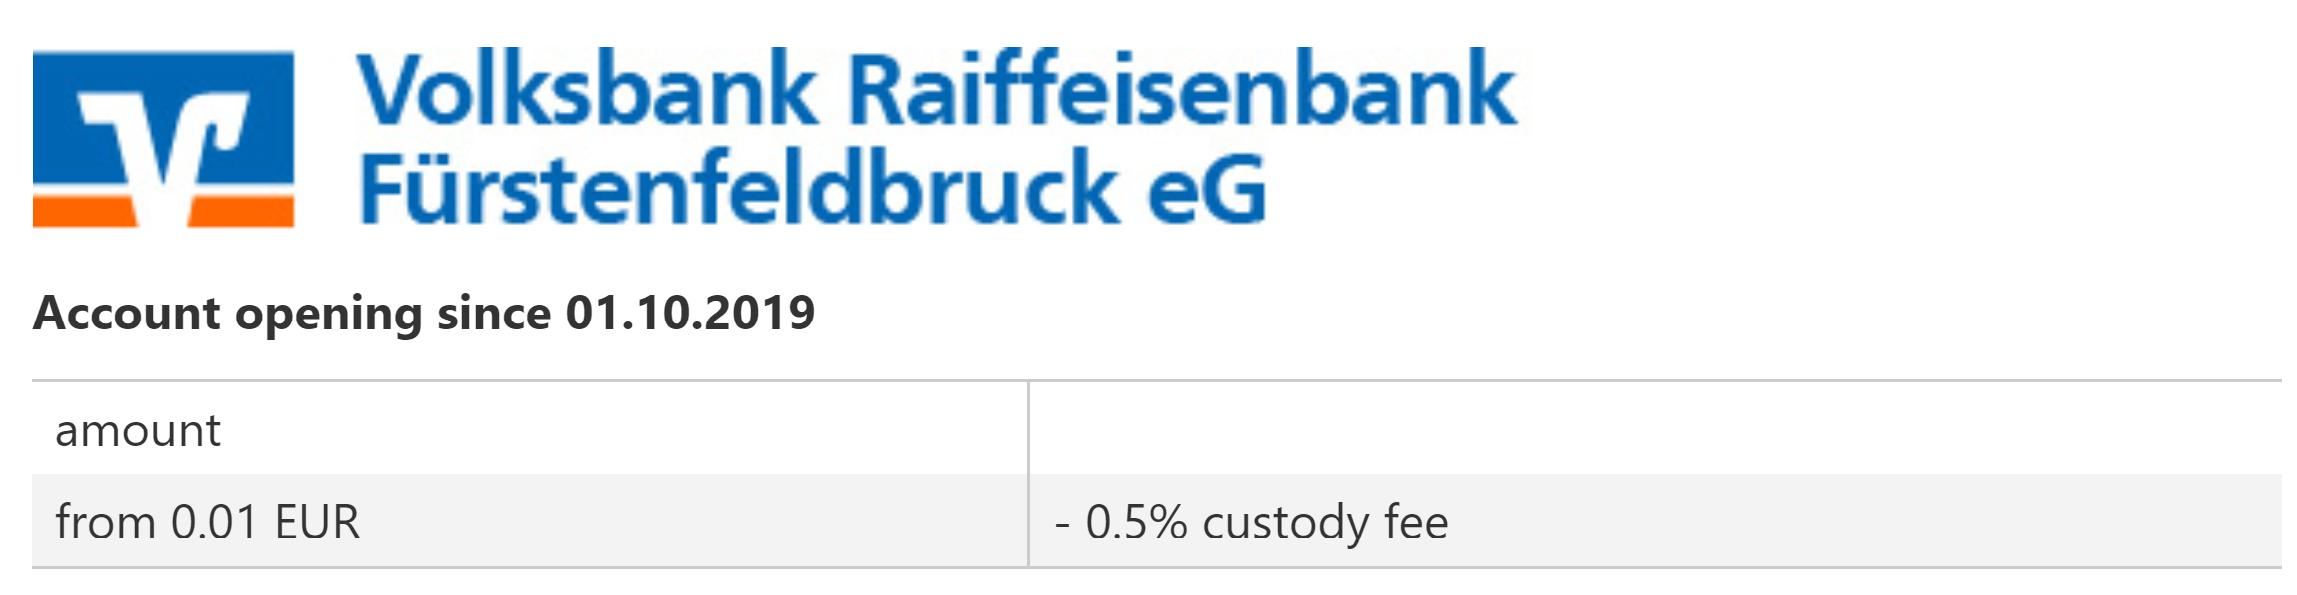 "Encuesta: 58% de los bancos alemanes cobran tasas de interés negativas ""ancho ="" 2297 ""height ="" 595 ""srcset ="" https://blackswanfinances.com/wp-content/uploads/2019/11/volksbank-furstenfeldbruck-fee.png 2297w, https://news.bitcoin.com/wp- content / uploads / 2019/11 / volksbank-furstenfeldbruck-fee-300x78.png 300w, https://news.bitcoin.com/wp-content/uploads/2019/11/volksbank-furstenfeldbruck-fee-1024x265.png 1024w, https://news.bitcoin.com/wp-content/uploads/2019/11/volksbank-furstenfeldbruck-fee-768x199.png 768w, https://news.bitcoin.com/wp-content/uploads/2019/11 /volksbank-furstenfeldbruck-fee-1536x398.png 1536w, https://news.bitcoin.com/wp-content/uploads/2019/11/volksbank-furstenfeldbruck-fee-2048x531.png 2048w, https: //news.bitcoin .com / wp-content / uploads / 2019/11 / volksbank-furstenfeldbruck-fee-696x180.png 696w, https://news.bitcoin.com/wp-content/upload s / 2019/11 / volksbank-furstenfeldbruck-fee-1392x361.png 1392w, https://news.bitcoin.com/wp-content/uploads/2019/11/volksbank-furstenfeldbruck-fee-1068x277.png 1068w, https: //news.bitcoin.com/wp-content/uploads/2019/11/volksbank-furstenfeldbruck-fee-1621x420.png 1621w, https://news.bitcoin.com/wp-content/uploads/2019/11/volksbank -furstenfeldbruck-fee-1920x497.png 1920w ""tamaños ="" (ancho máximo: 2297px) 100vw, 2297px"